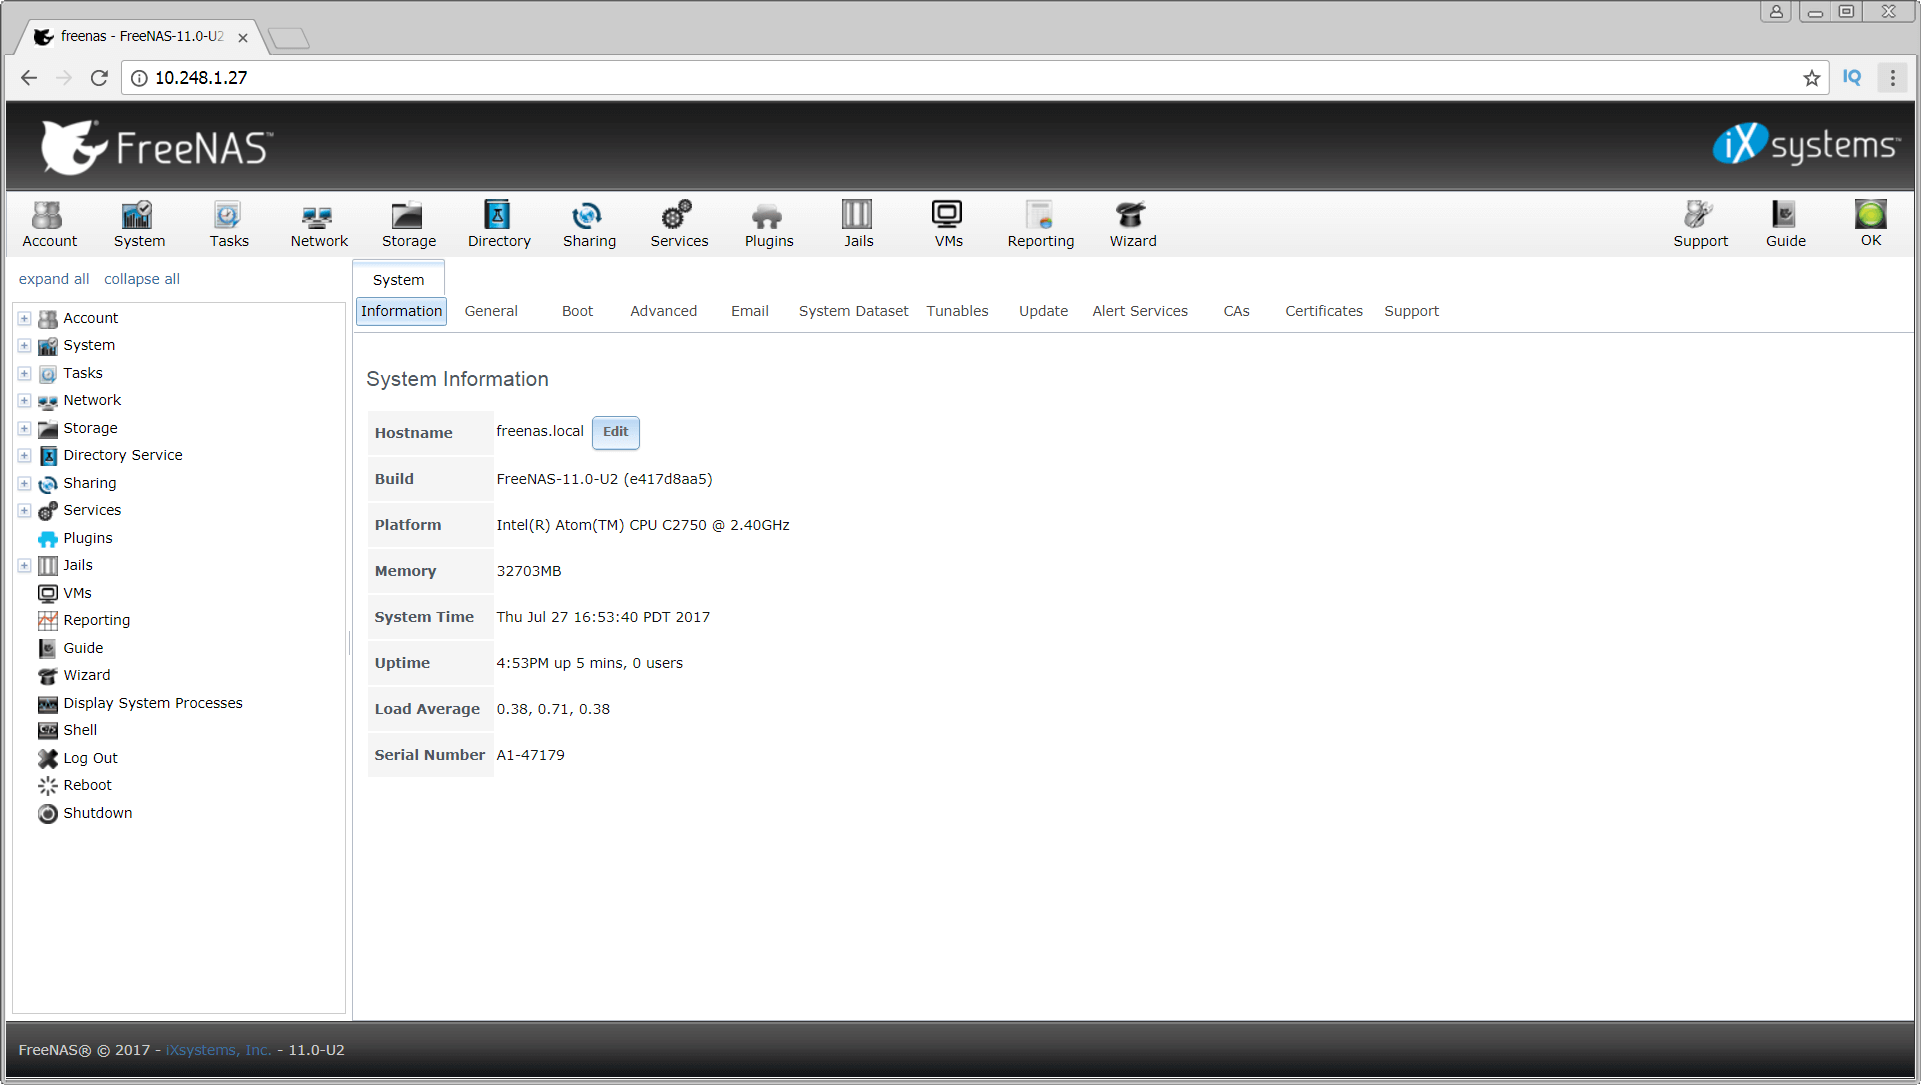 FreeNAS web interface